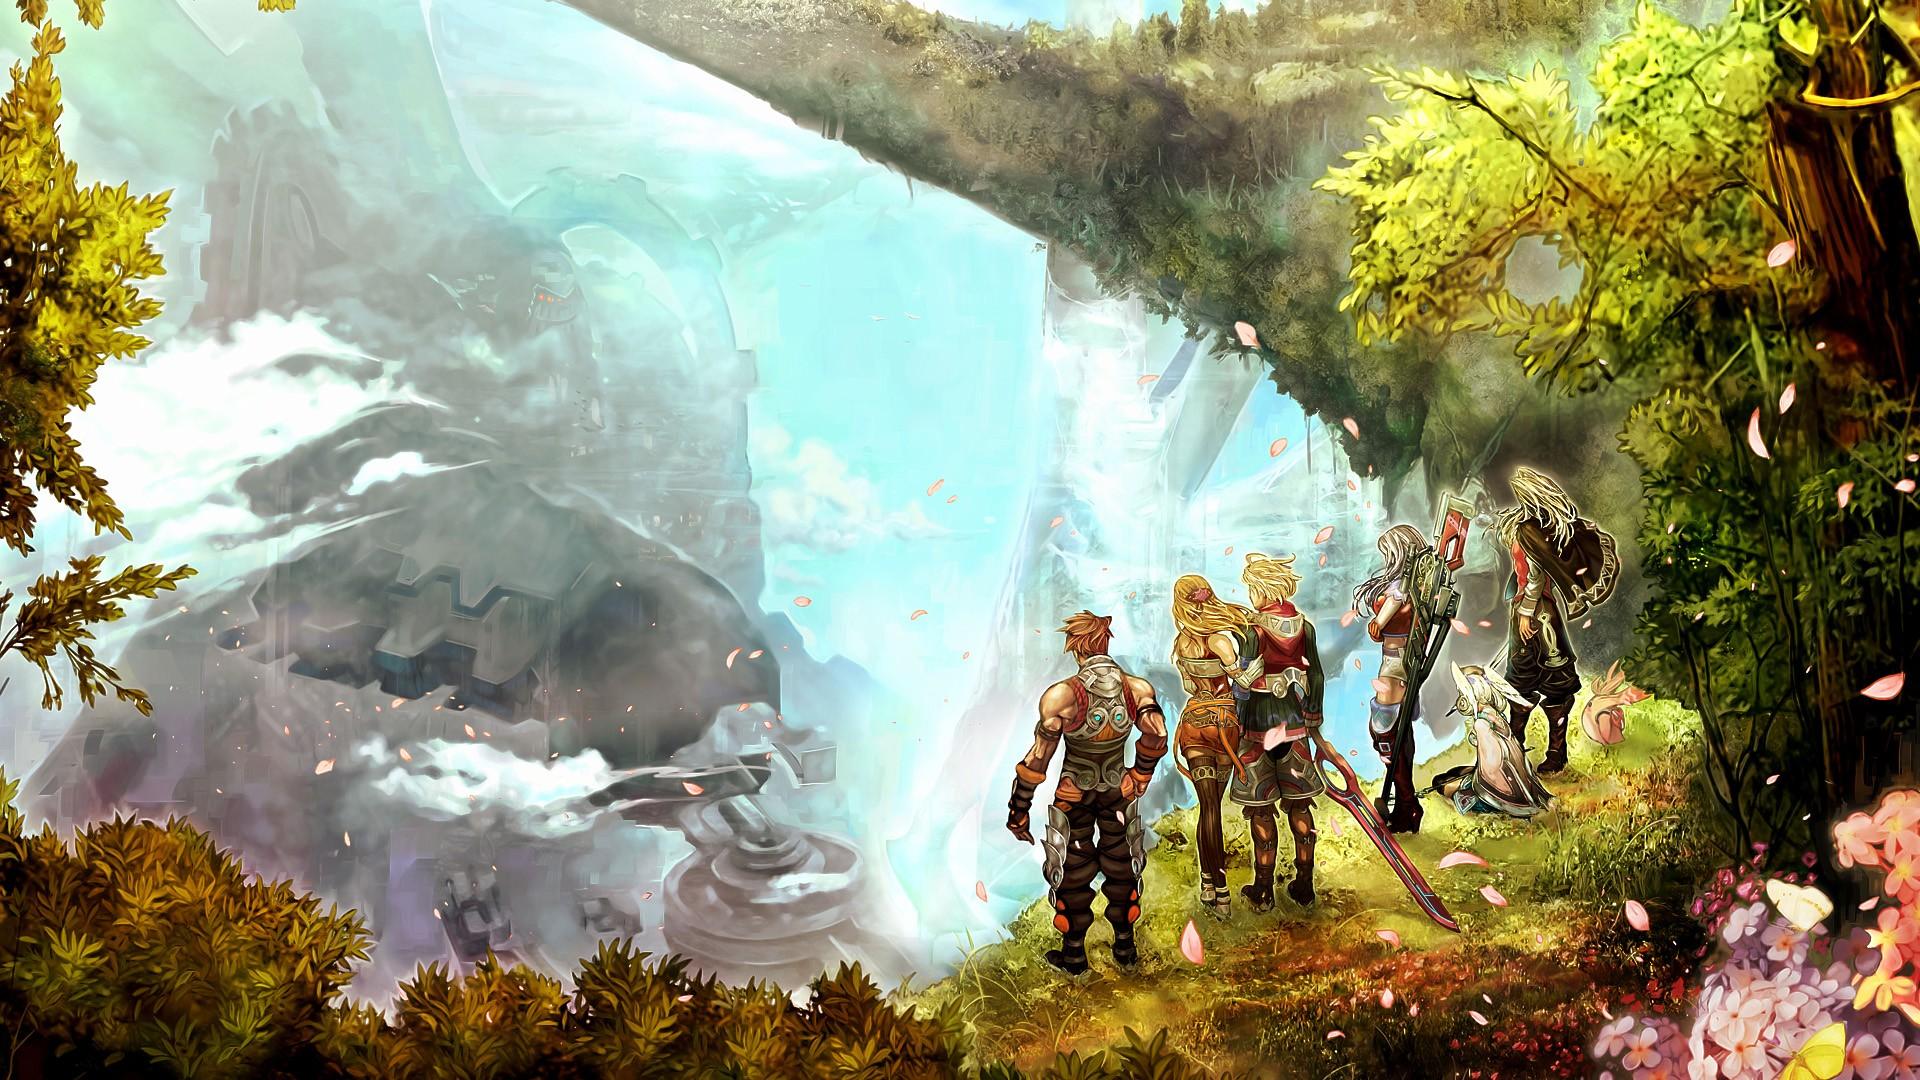 Wallpaper 1 Wallpaper from Xenoblade Chronicles gamepressurecom 1920x1080